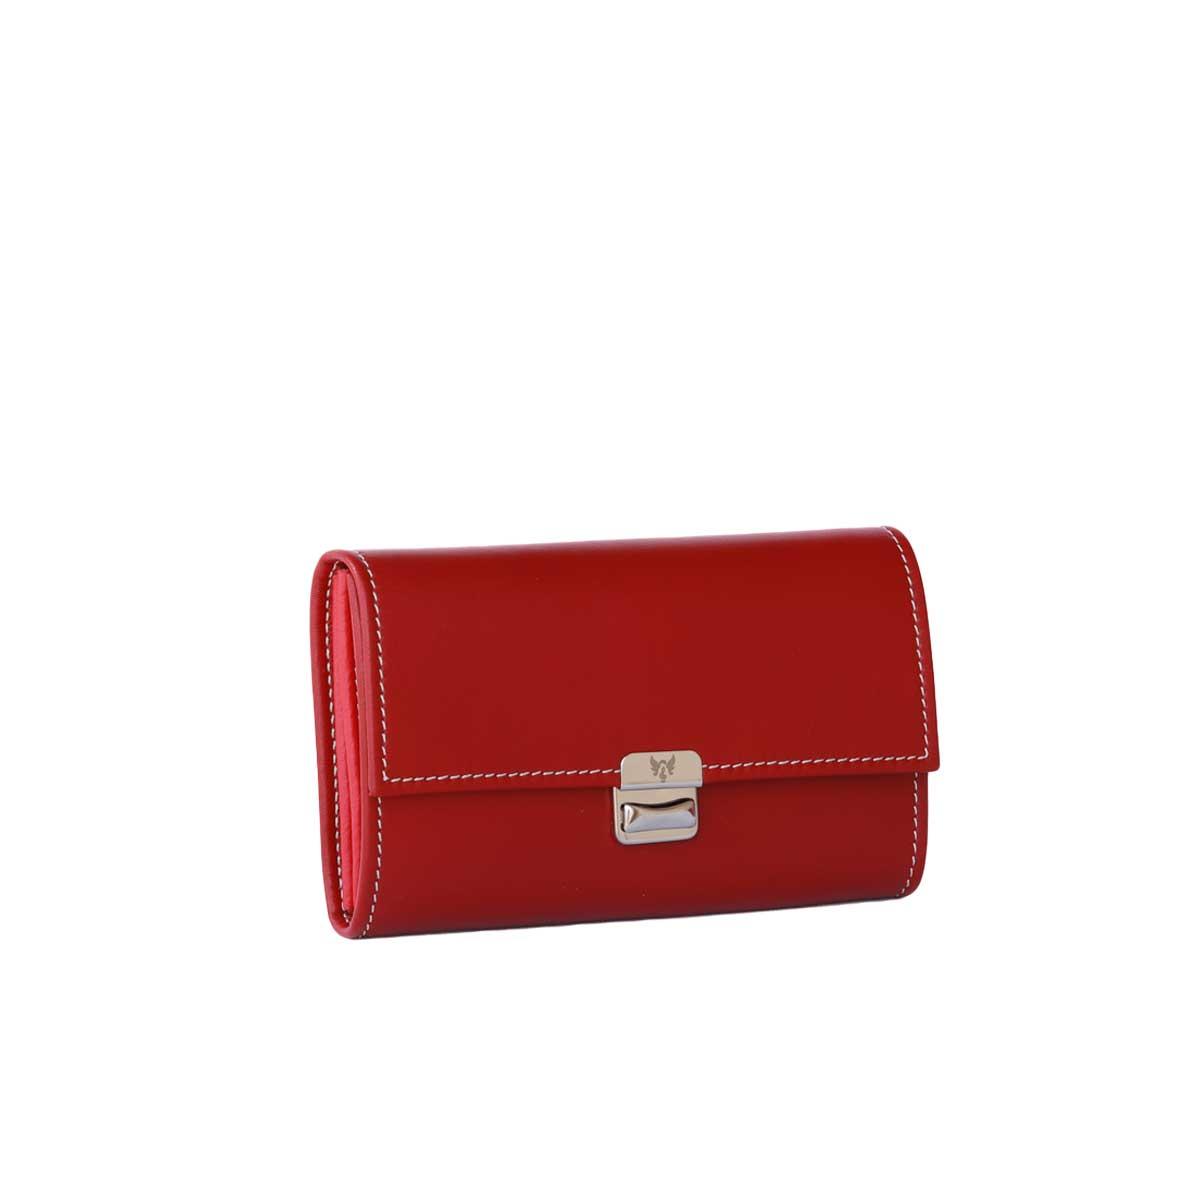 Leder Portemonnaie Damen Scarlet Rot M